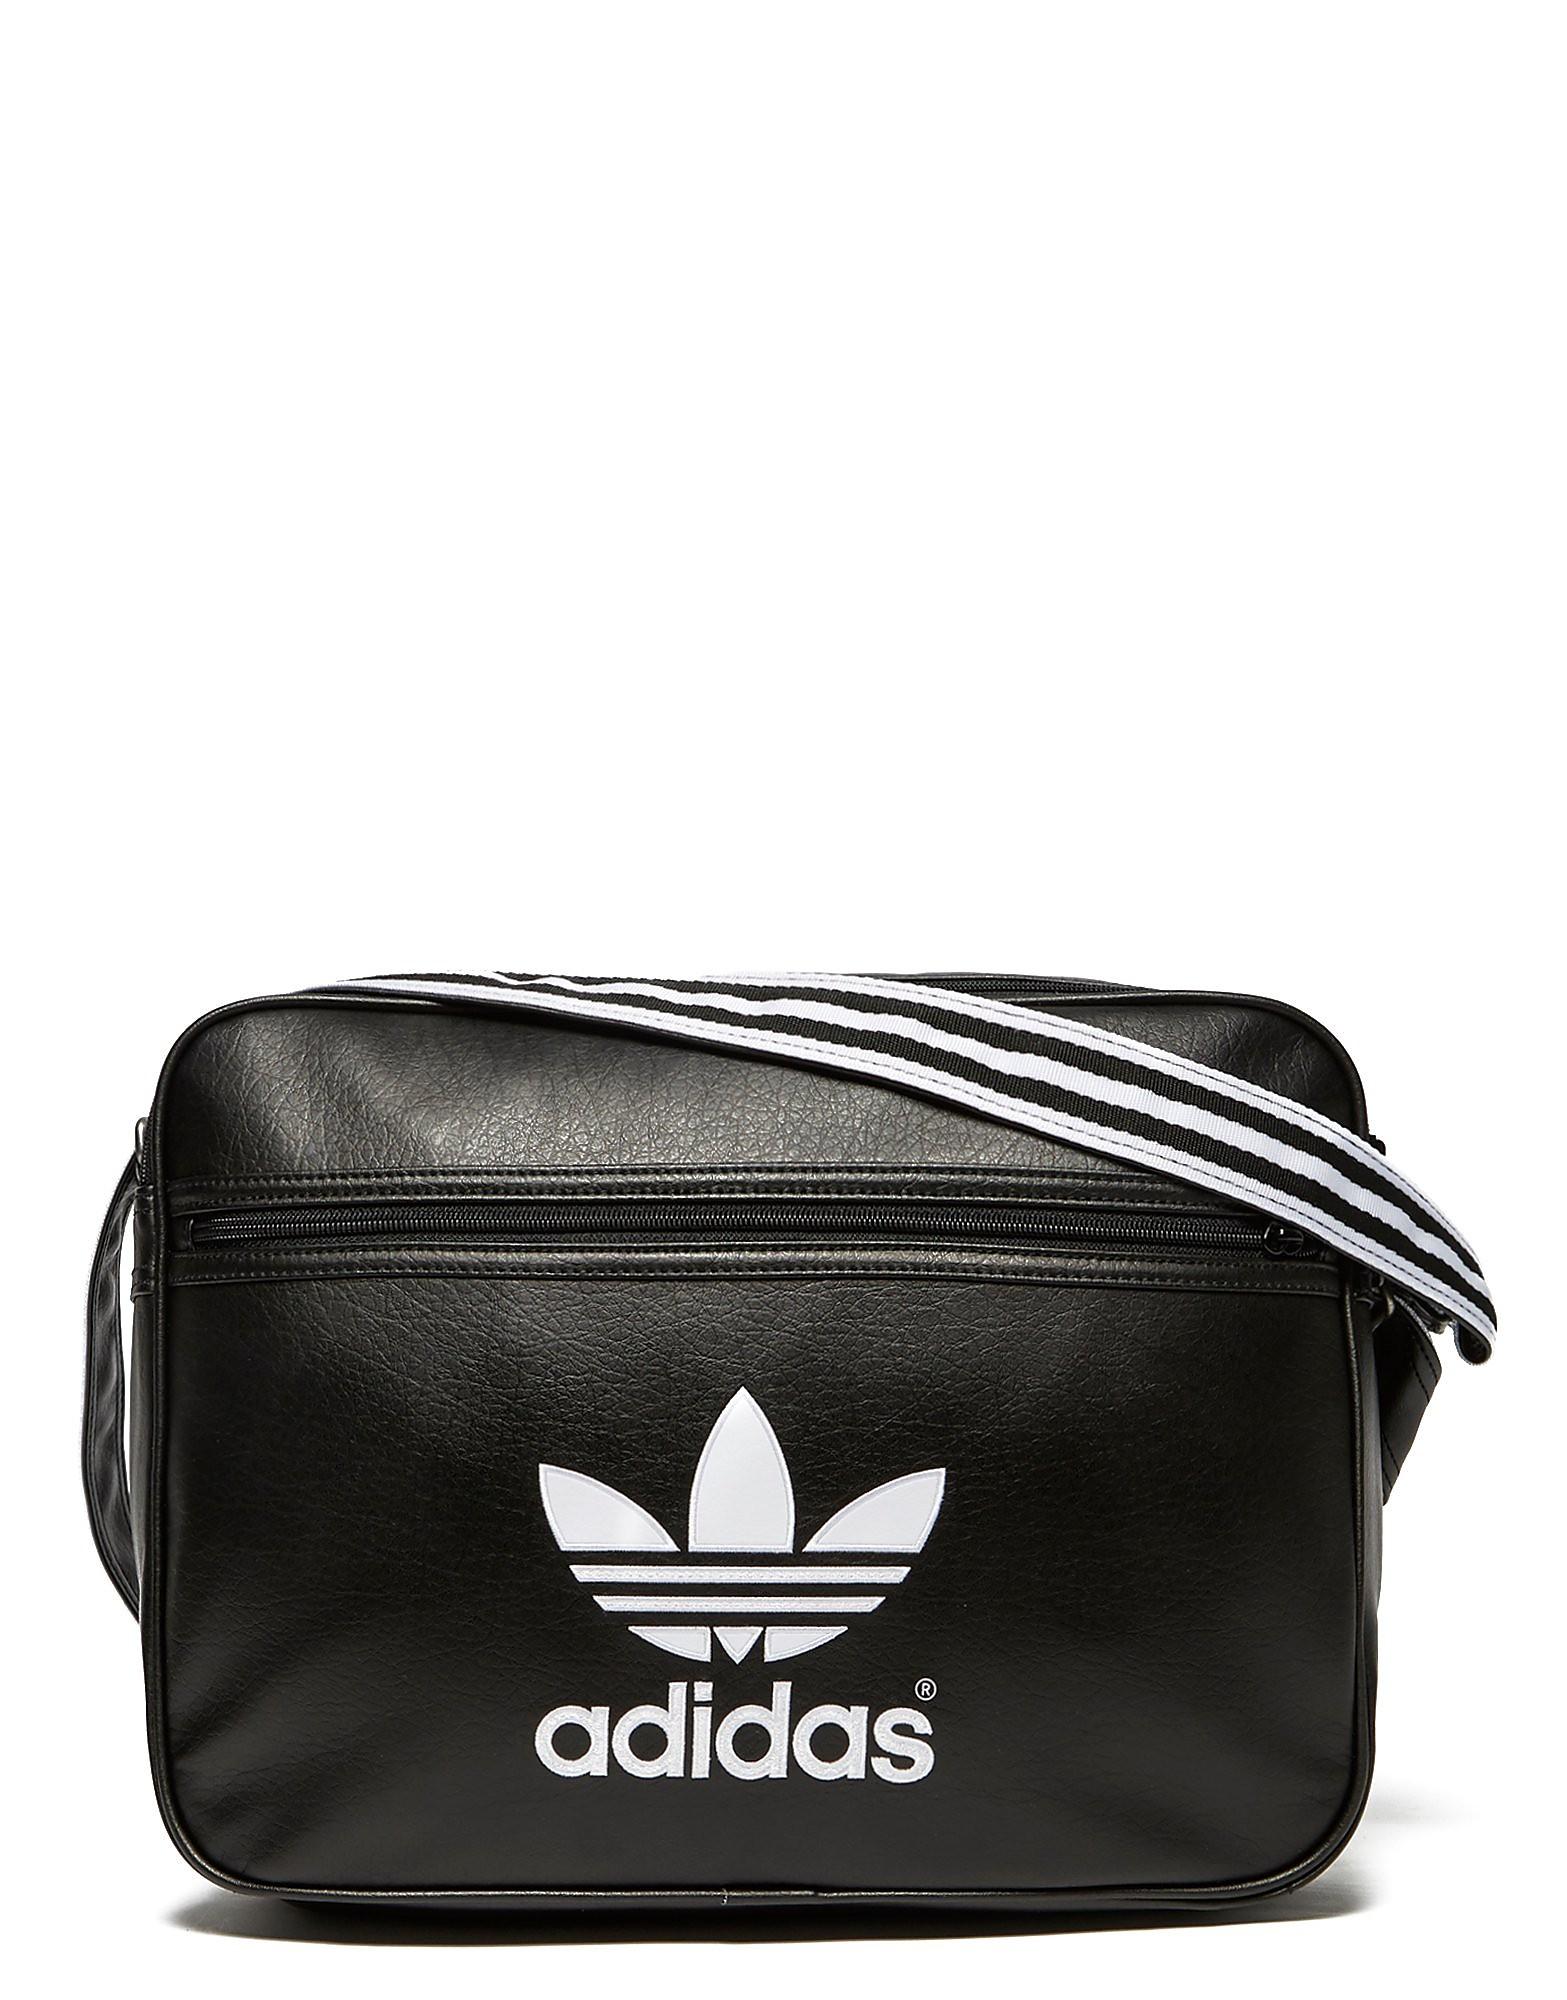 adidas Originals Airliner Bag